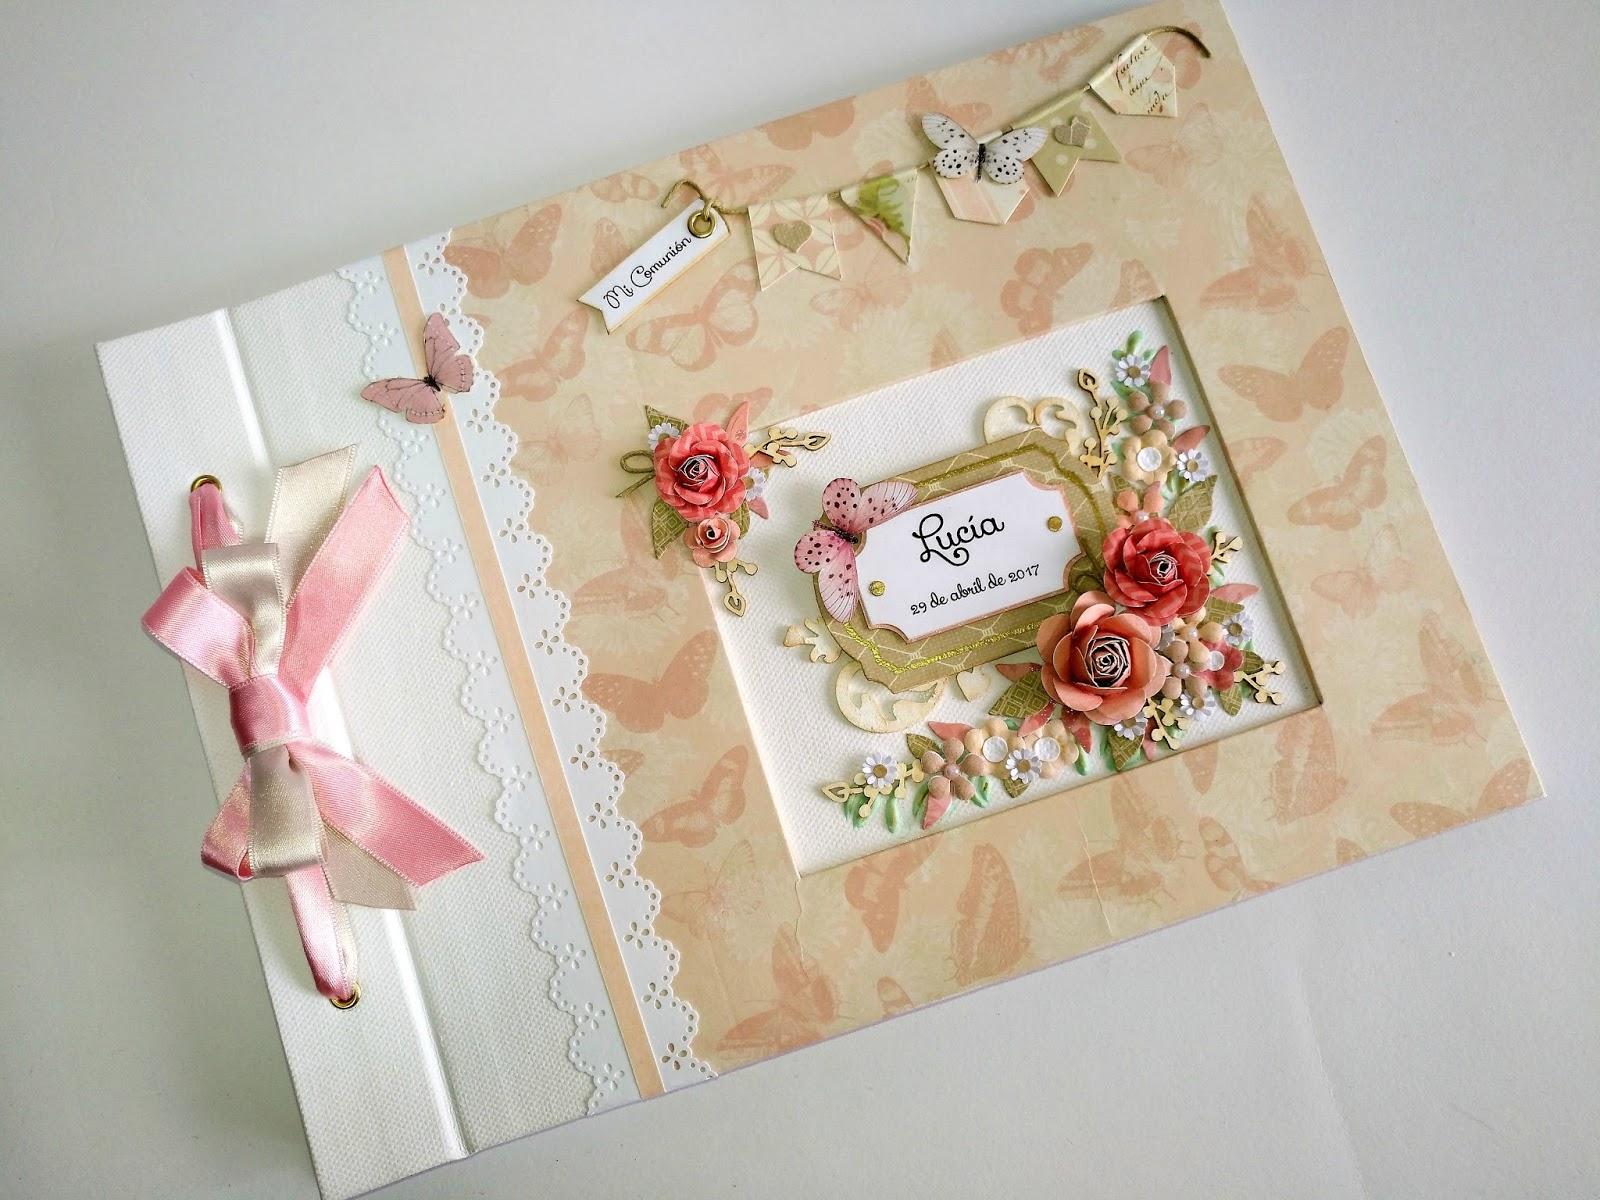 Libro de firmas para primera comuni n floral lluna nova for Interior libro de firmas comunion